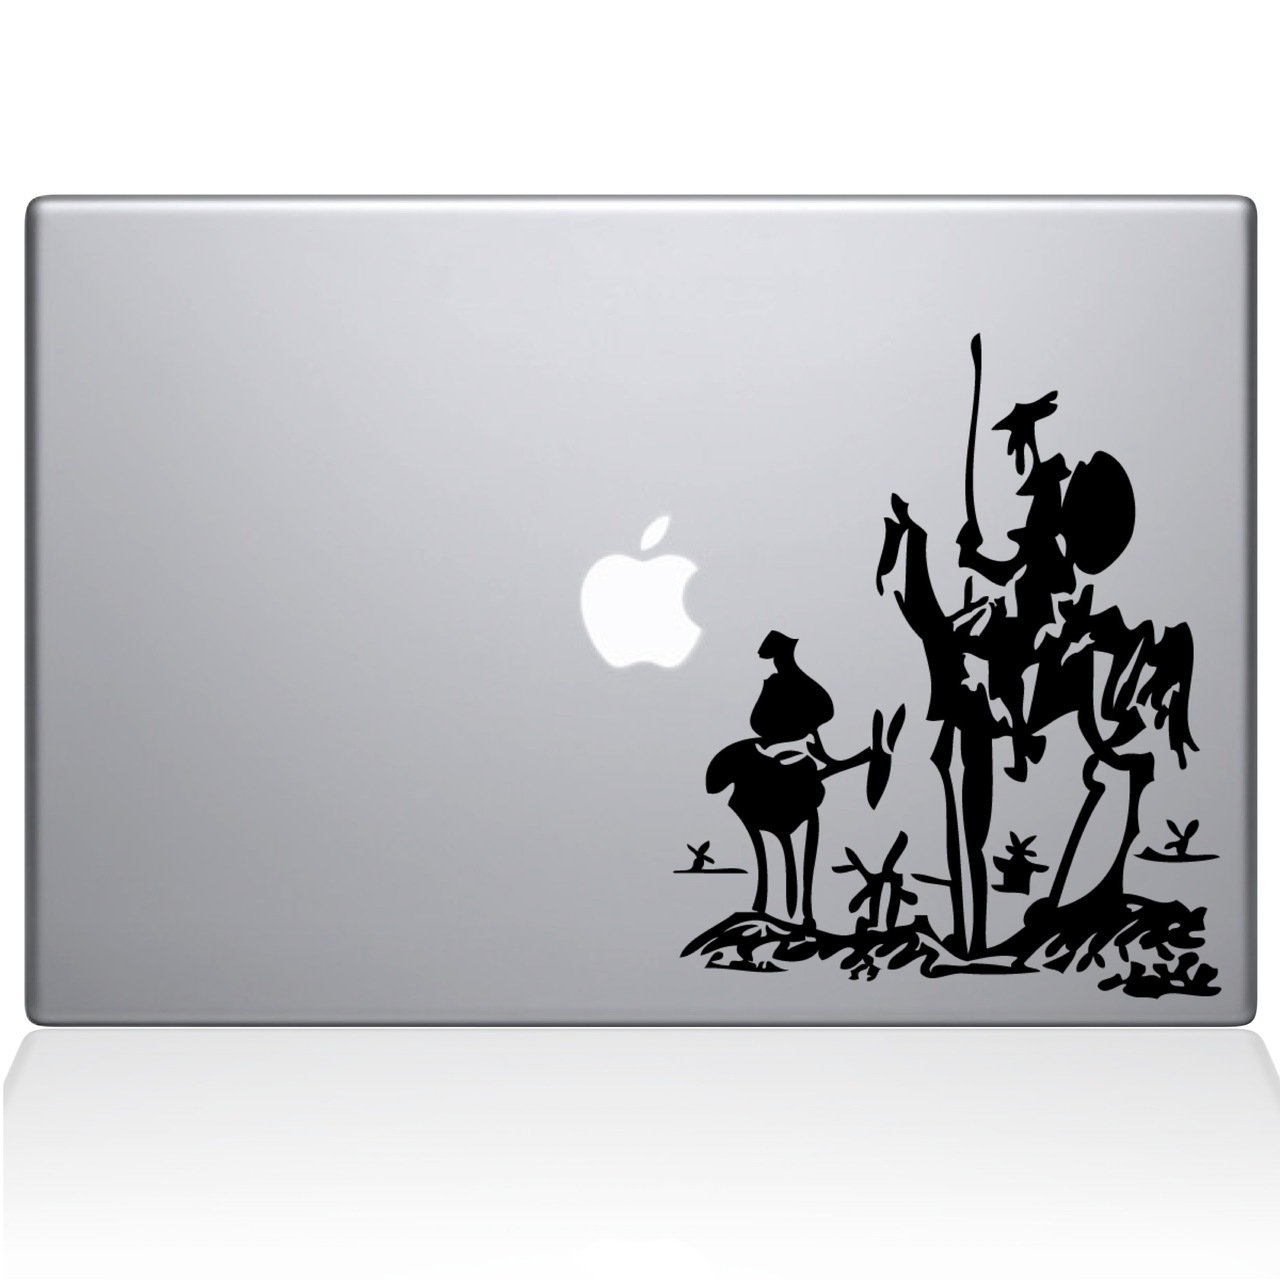 Don Quixote Macbookデカール Cut、Die Quixote Cut Vinyl ブラック Decal for Windows車、トラック、ツールボックス、ノートパソコン、ほぼすべてmacbook-ハード、滑らかな表面 ブラック Titans-Unique-Design-118832-Black ブラック B07174JD9B, ブティックアズベリー:dc60628b --- harrow-unison.org.uk